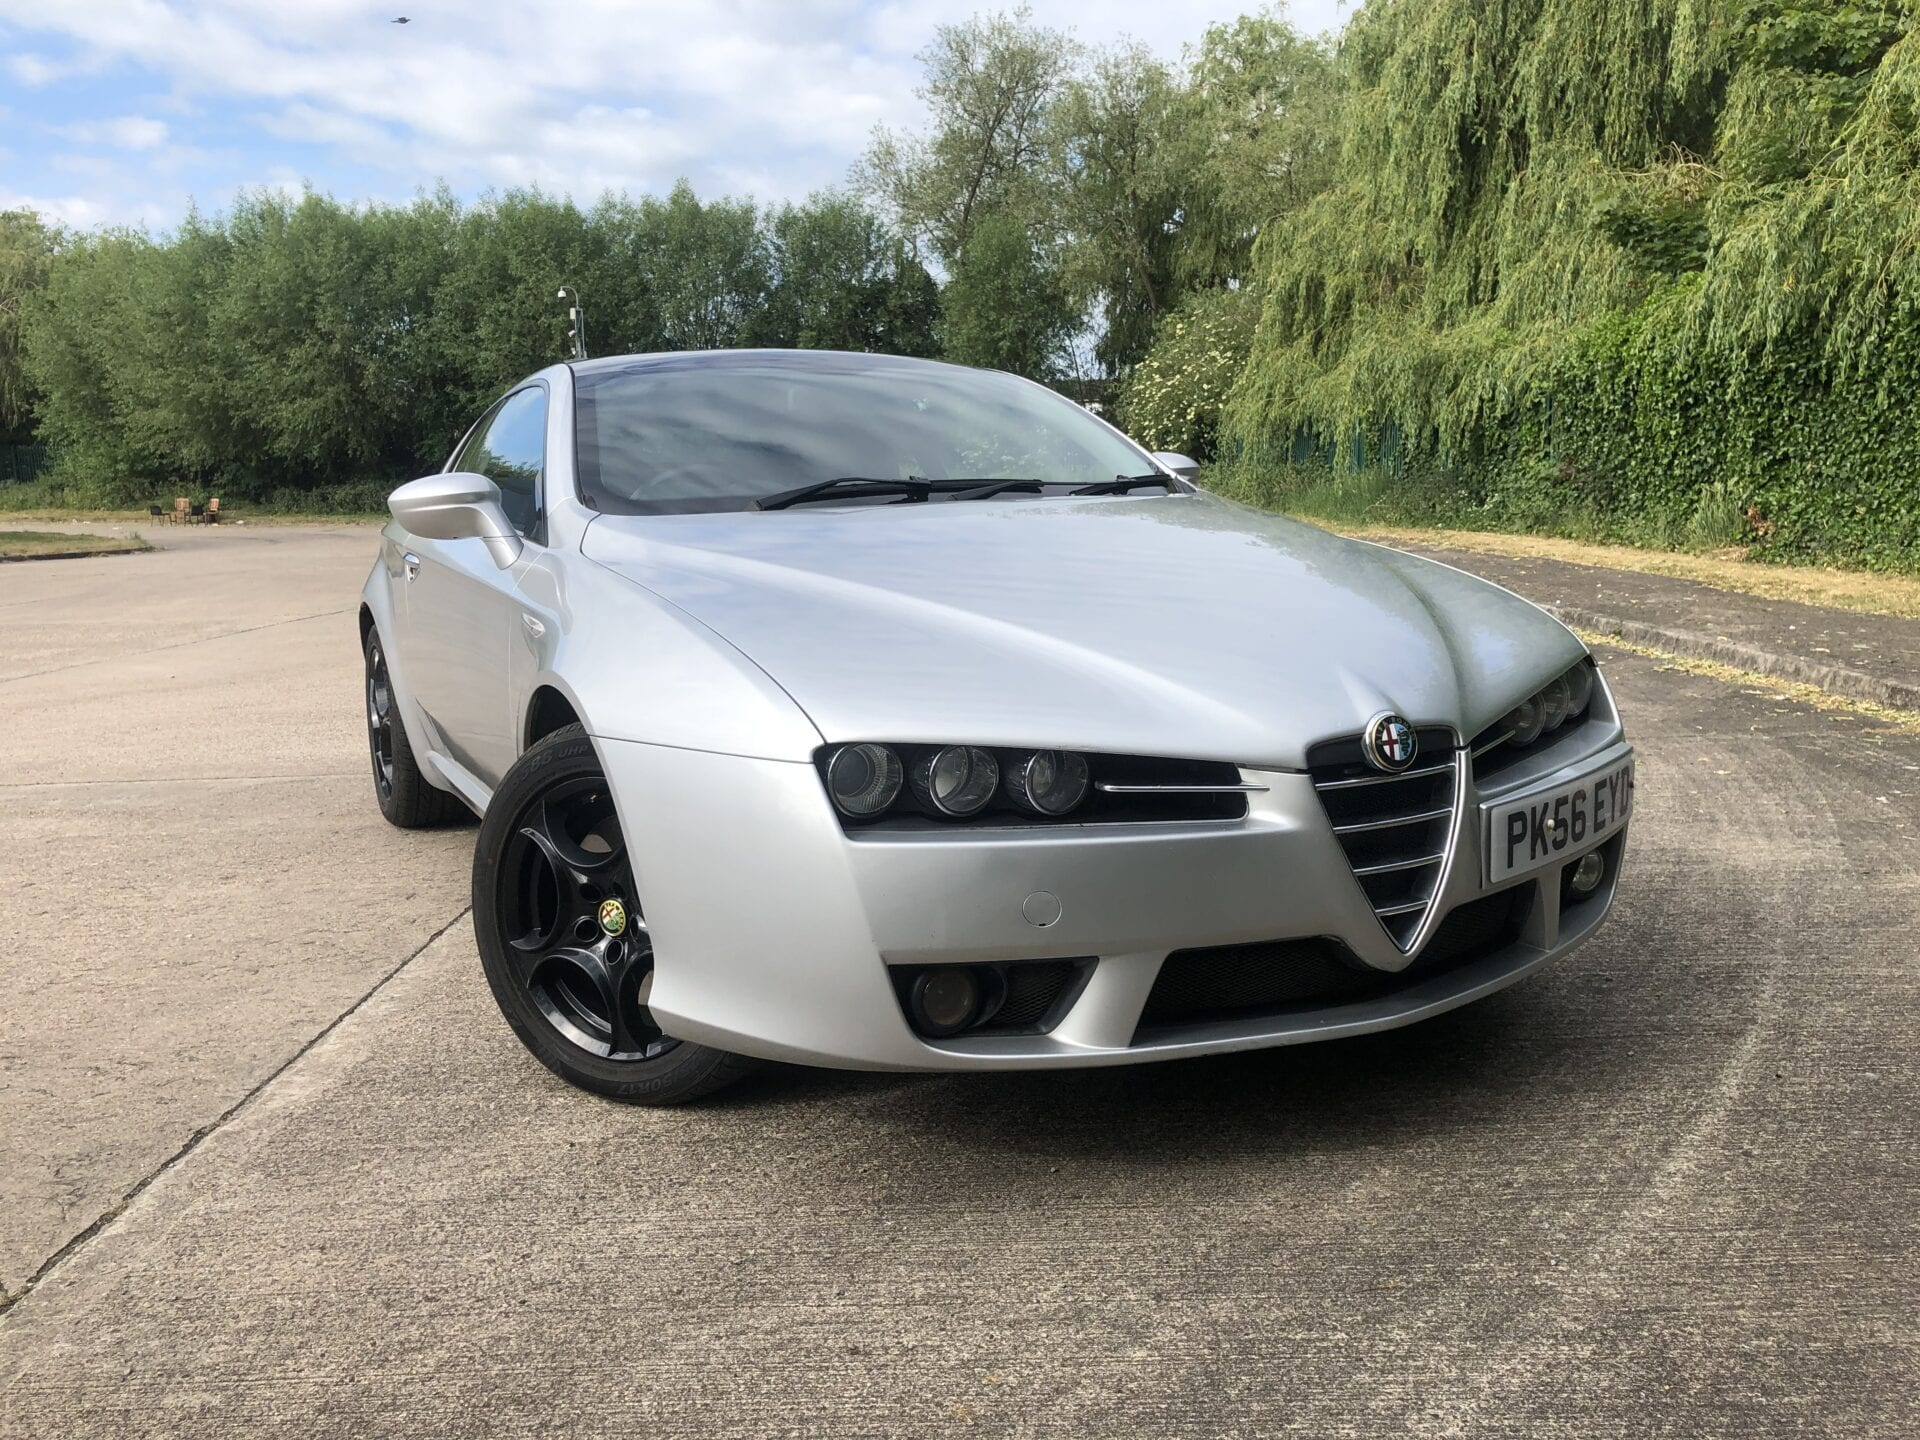 myCar UK - Alfa Romeo Brera 2.4 JTD SV 3dr